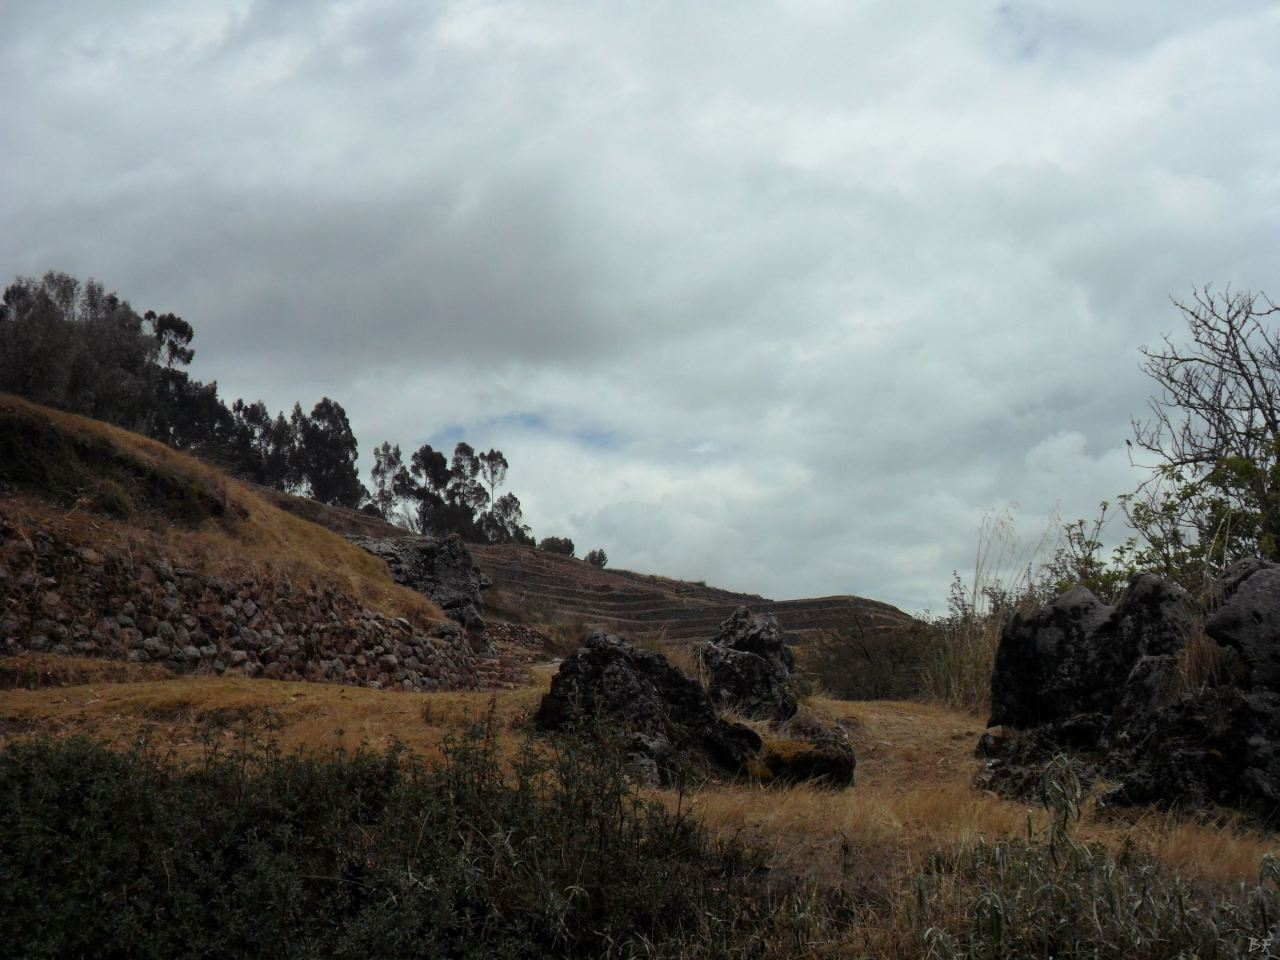 Chinchero-Mura-Poligonali-Piramide-Urubamba-Peru-73